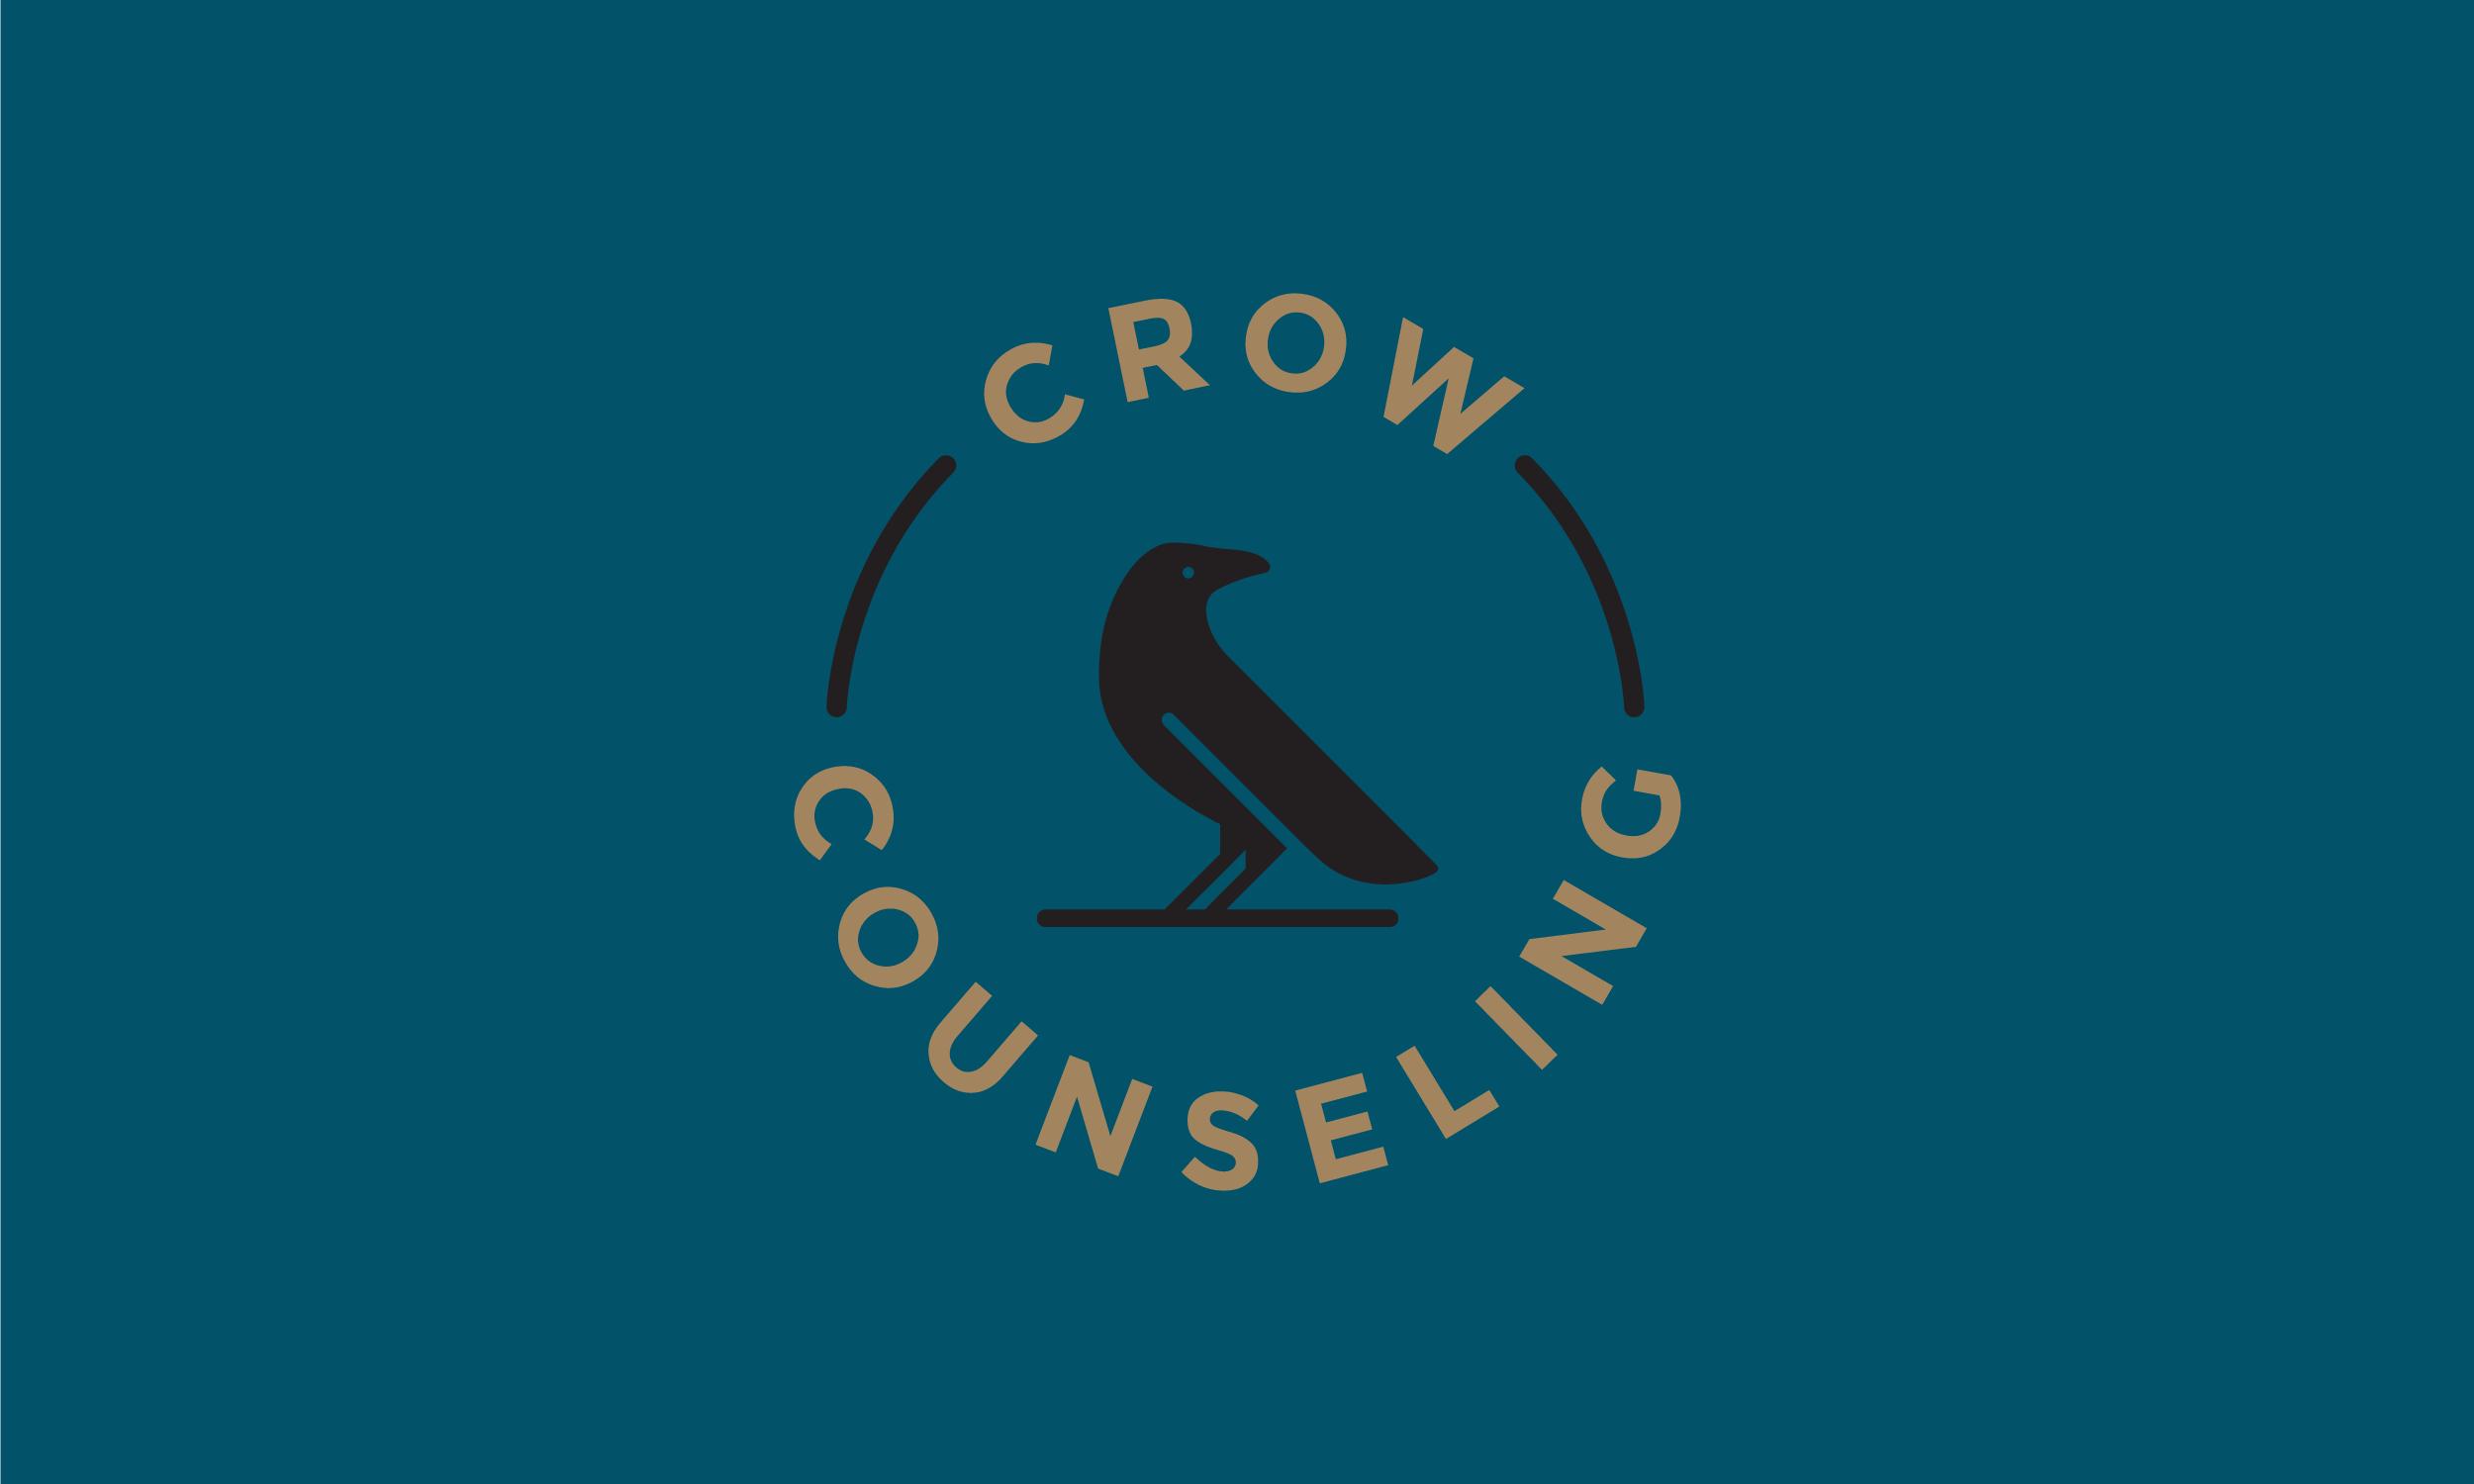 Finka_Studio_Crow_Counseling_Logo_Teal_2500x1500.png